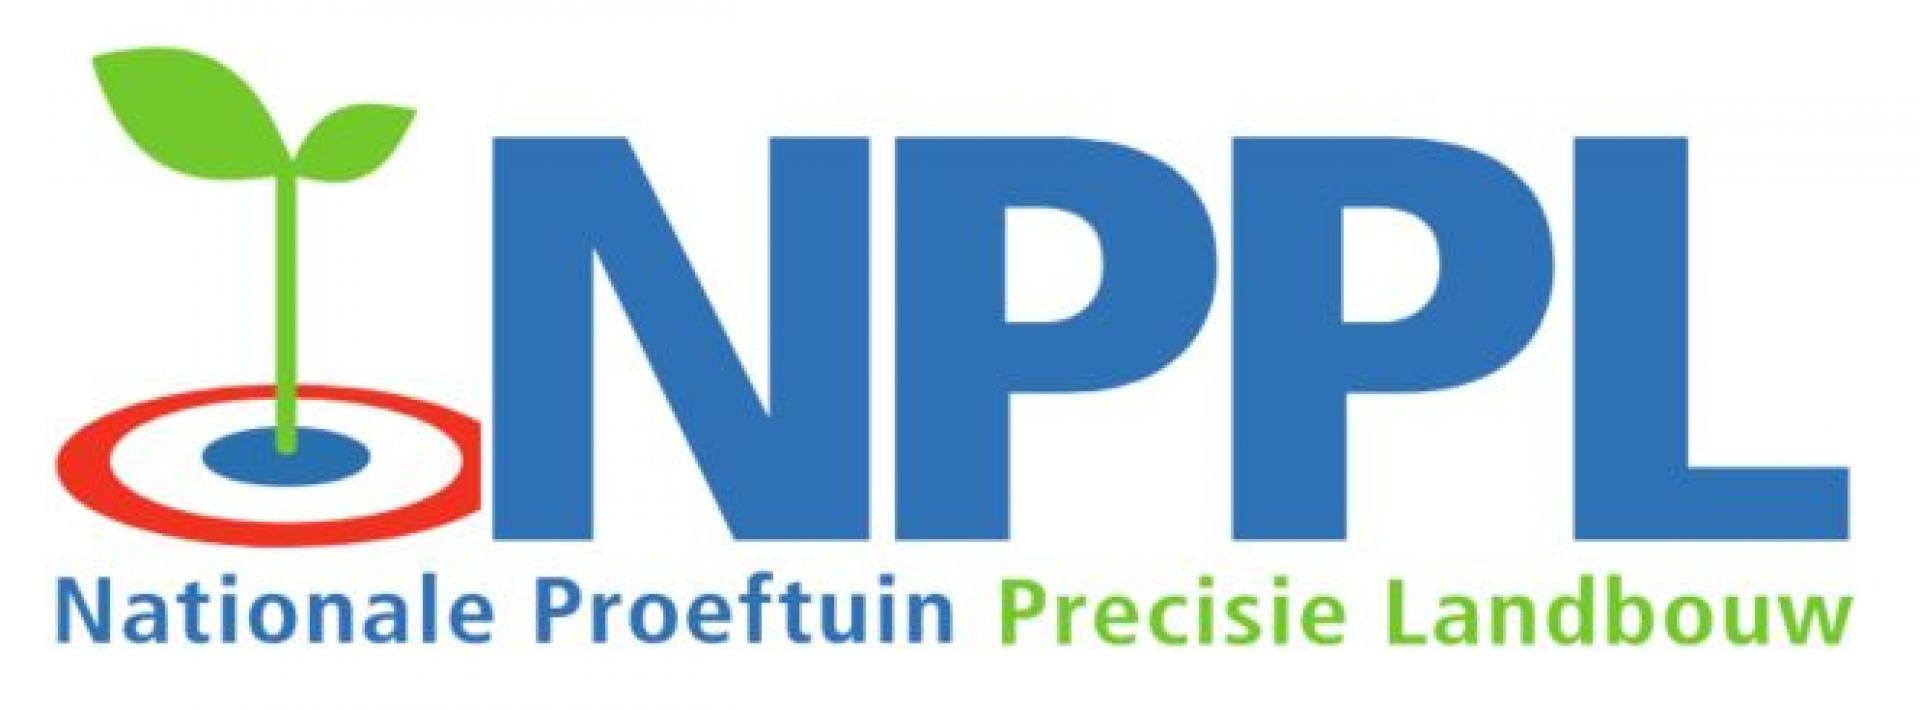 Nationale Proeftuin Precisie Landbouw (NPPL)